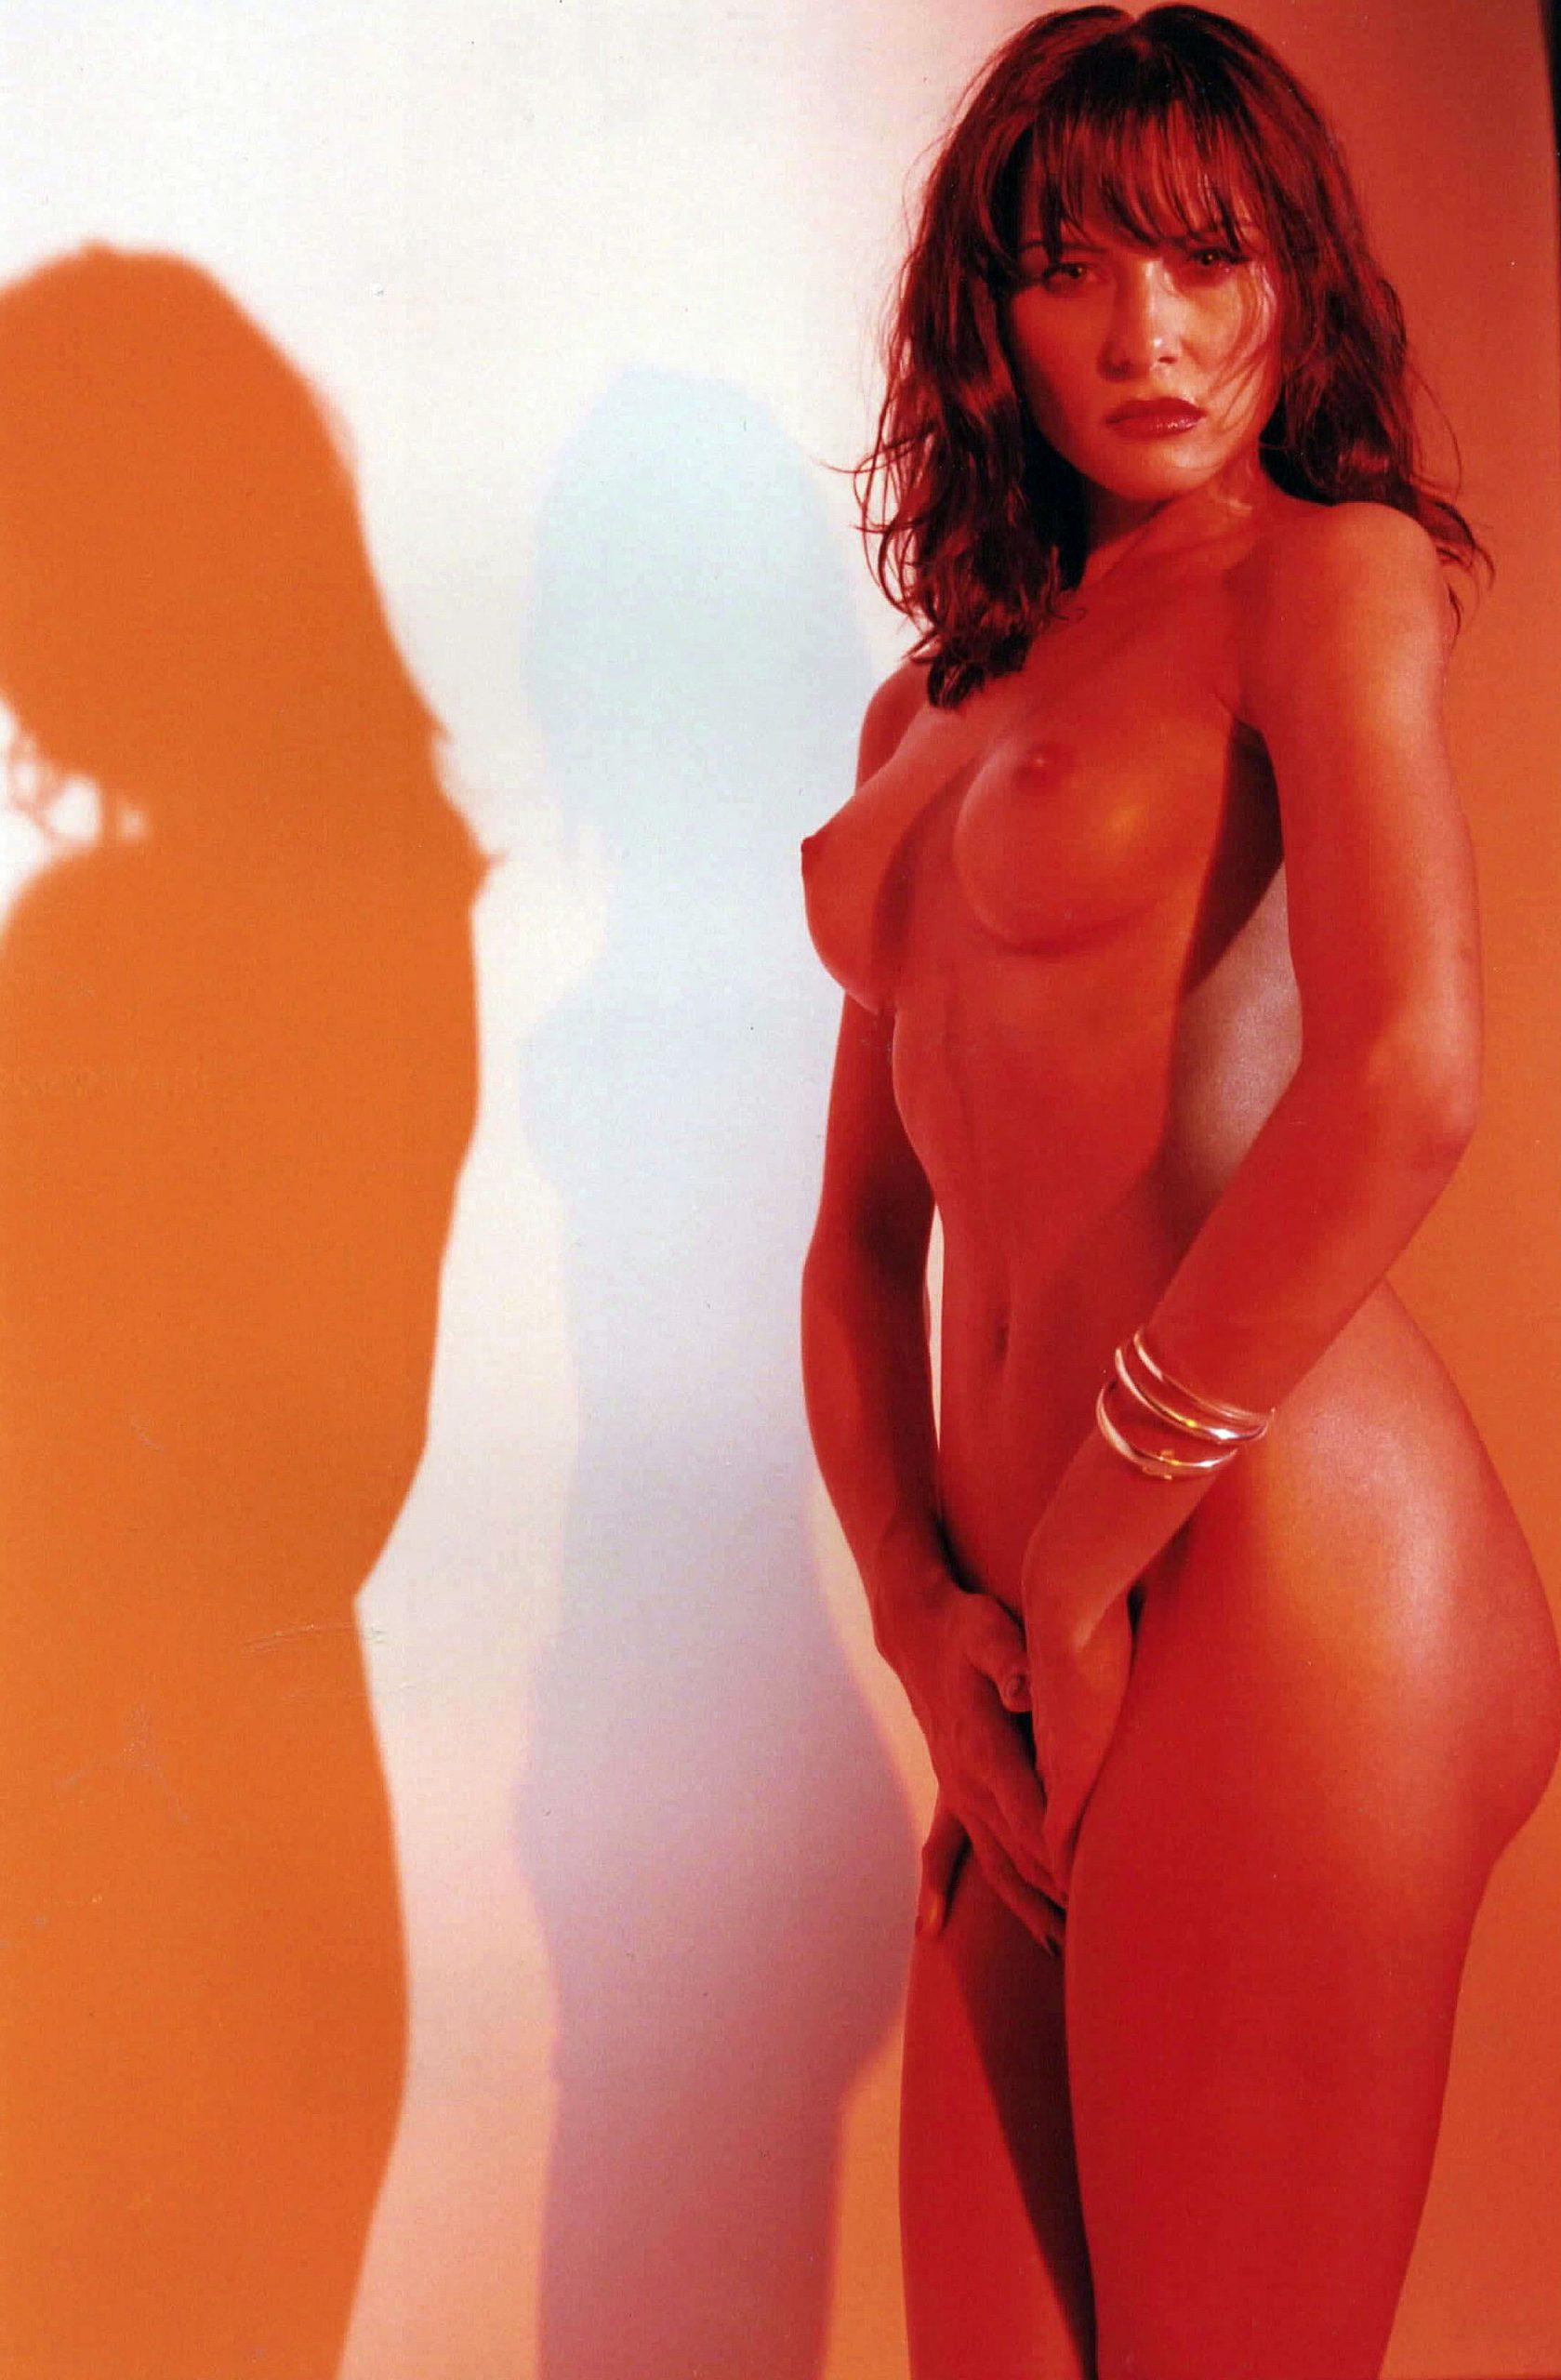 Melania trump nude leaked photos